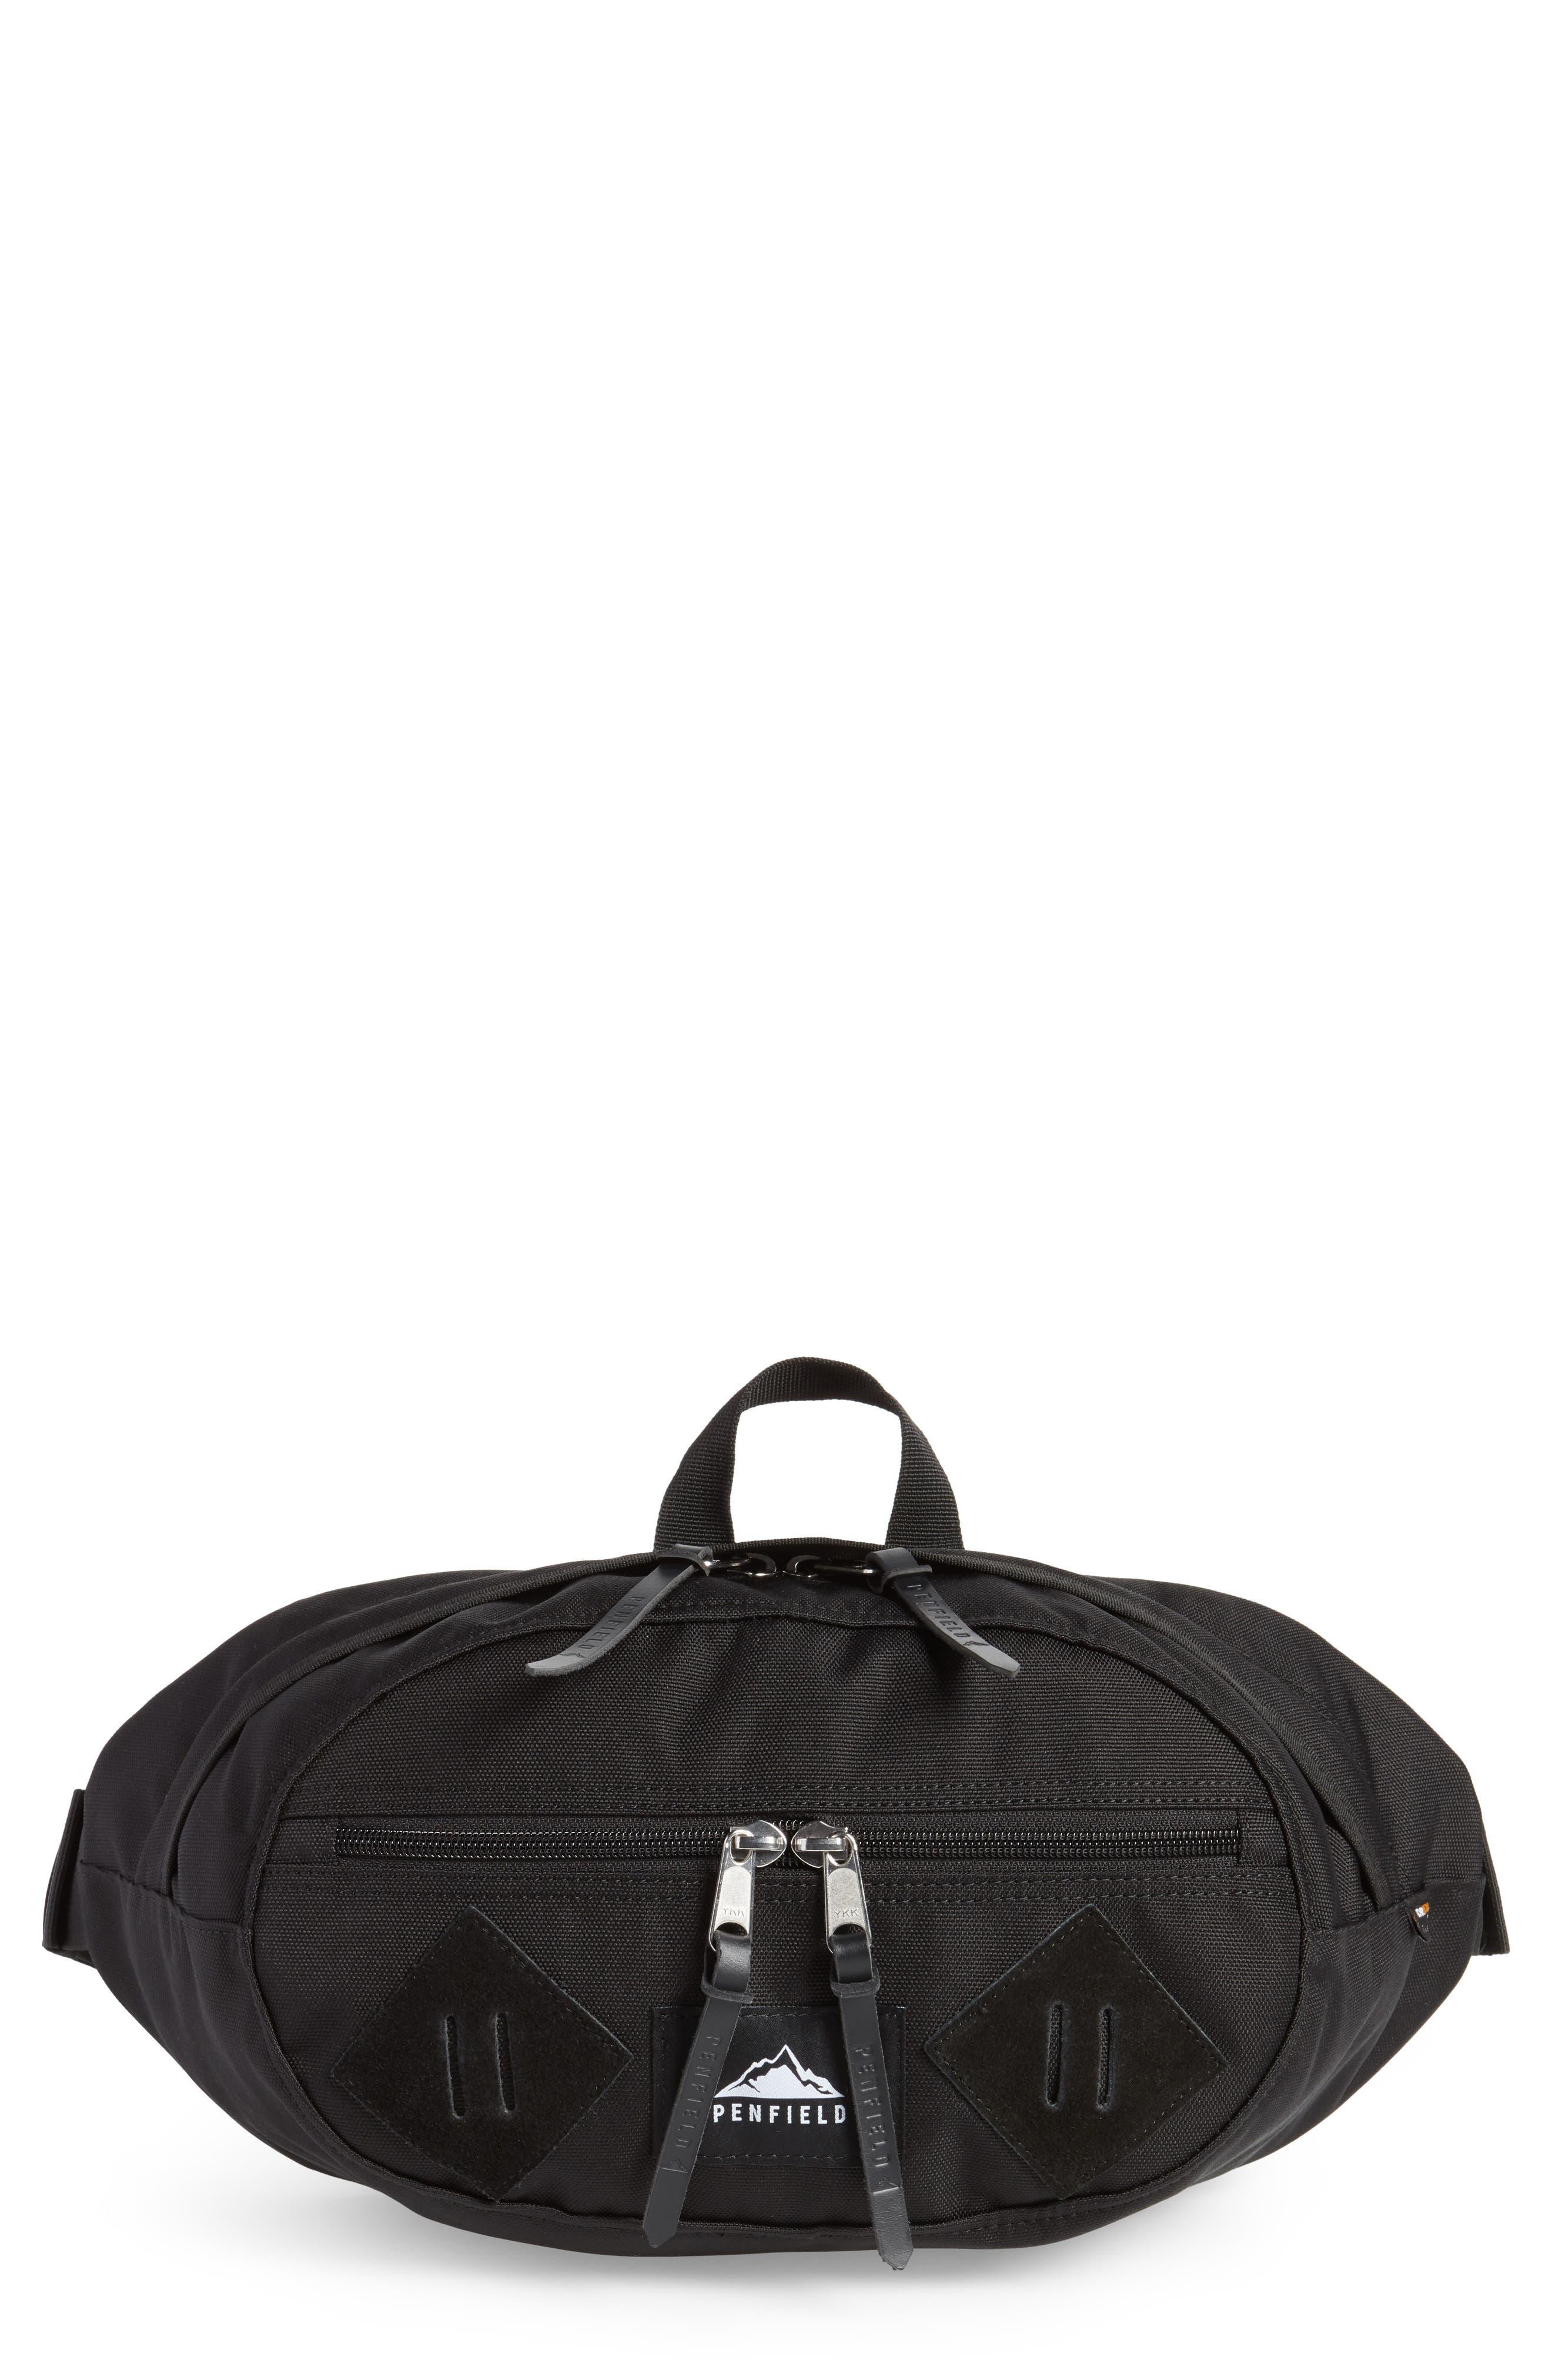 PENFIELD Gambel Belt Bag - Black